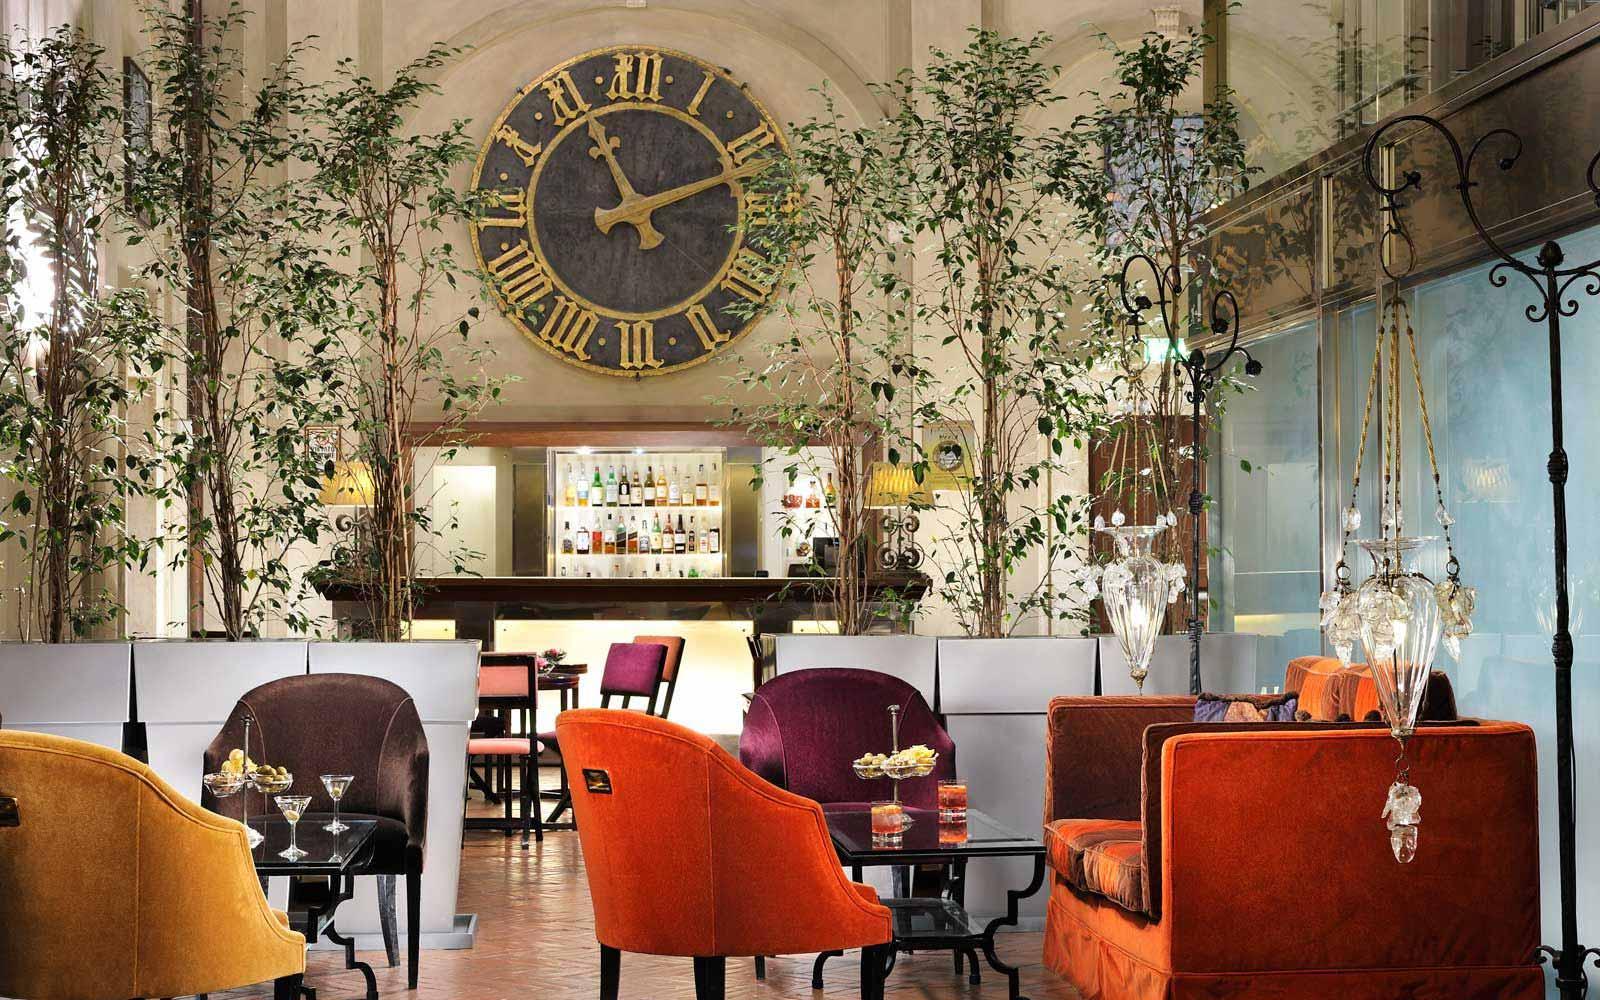 Bar at the Grand Hotel Continental